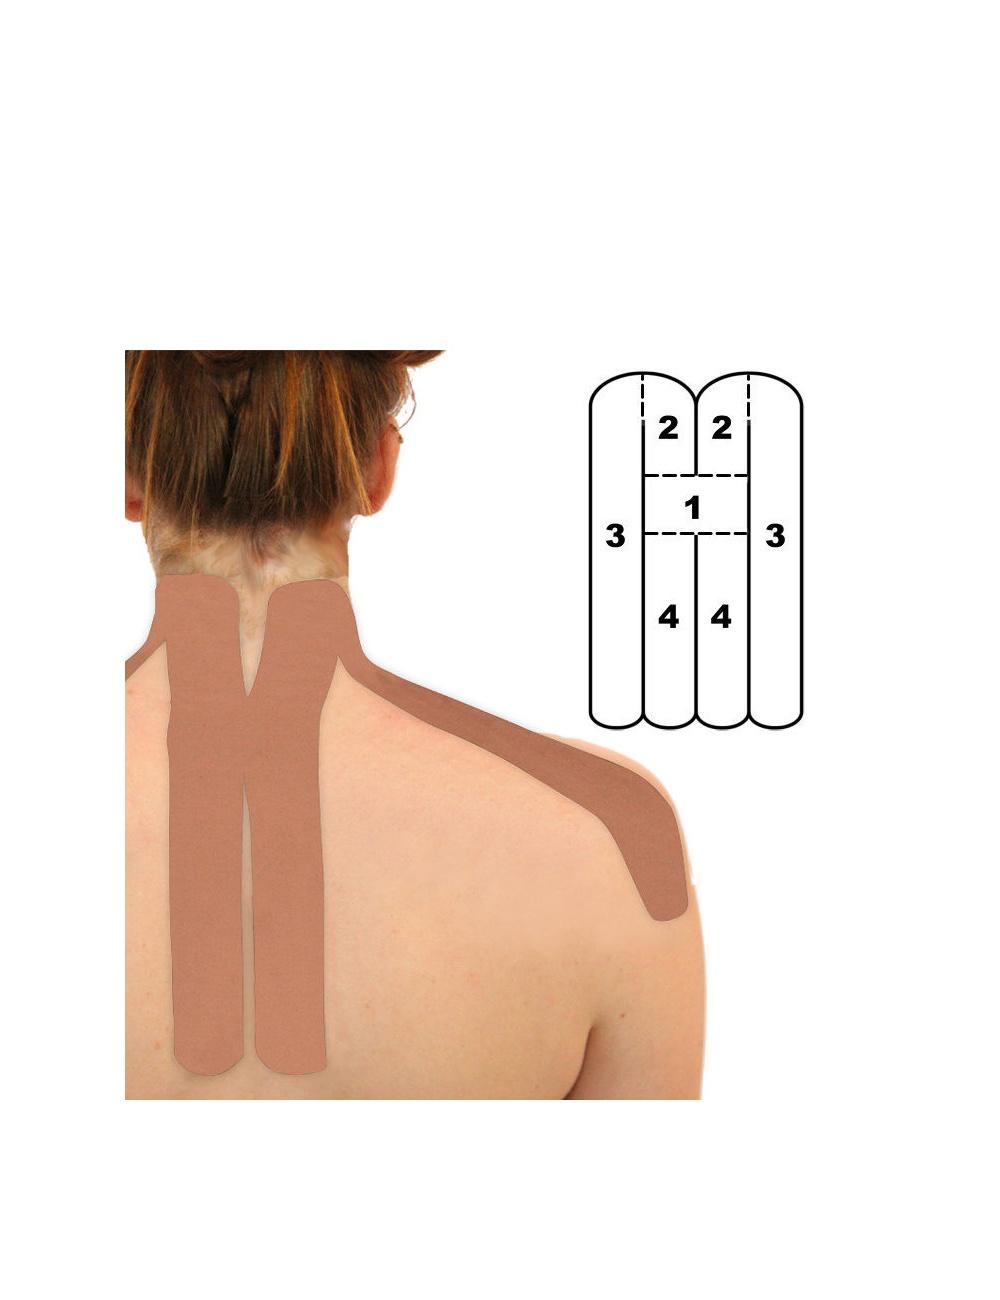 Kindmax Precut Neck Kinesiology Tape - Black